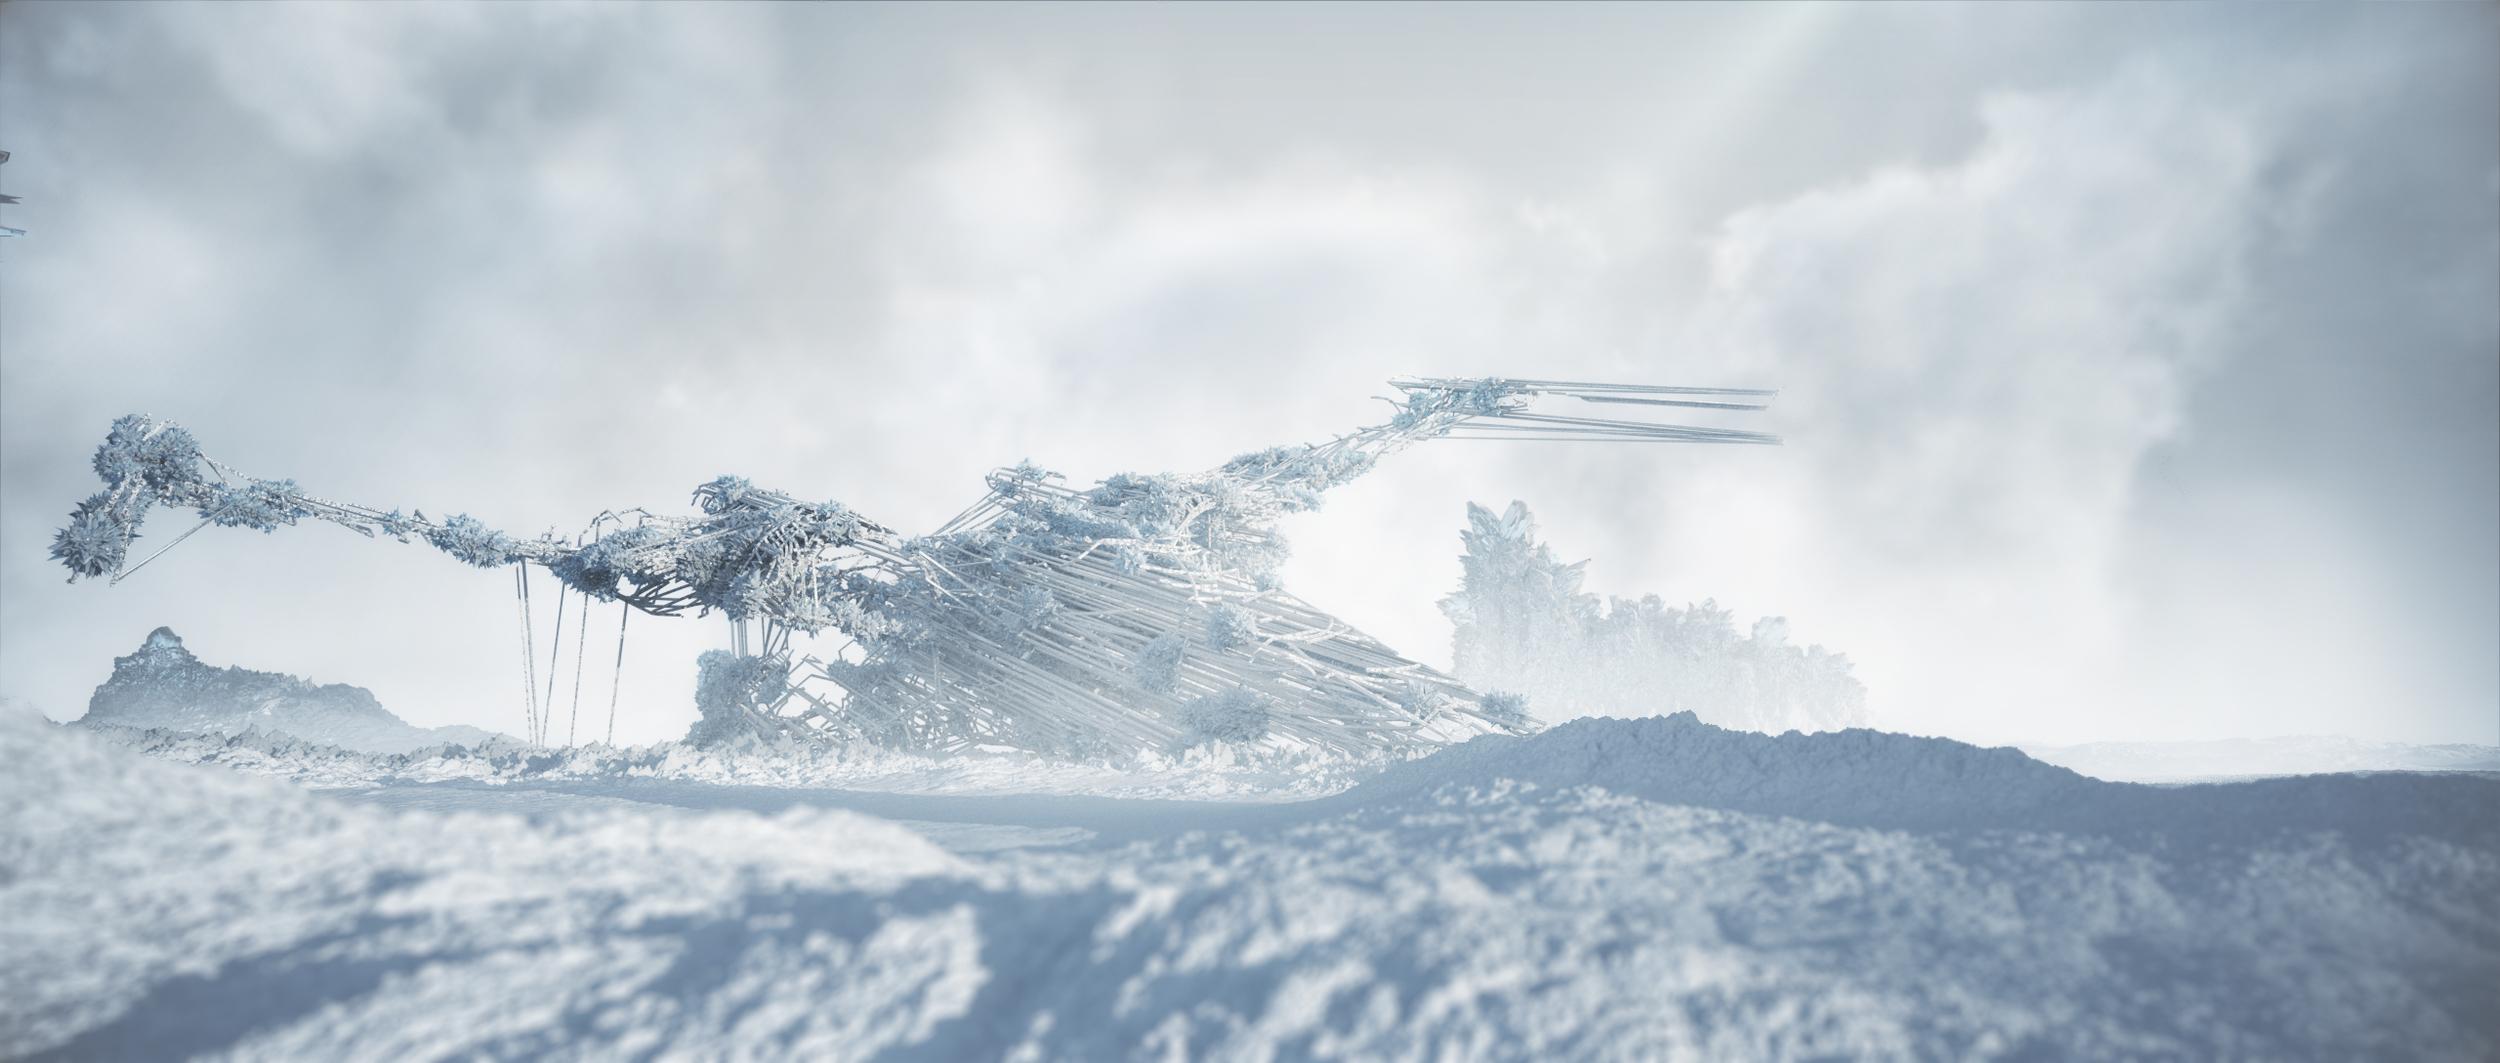 Frozen_Abstract_Xwing.jpg